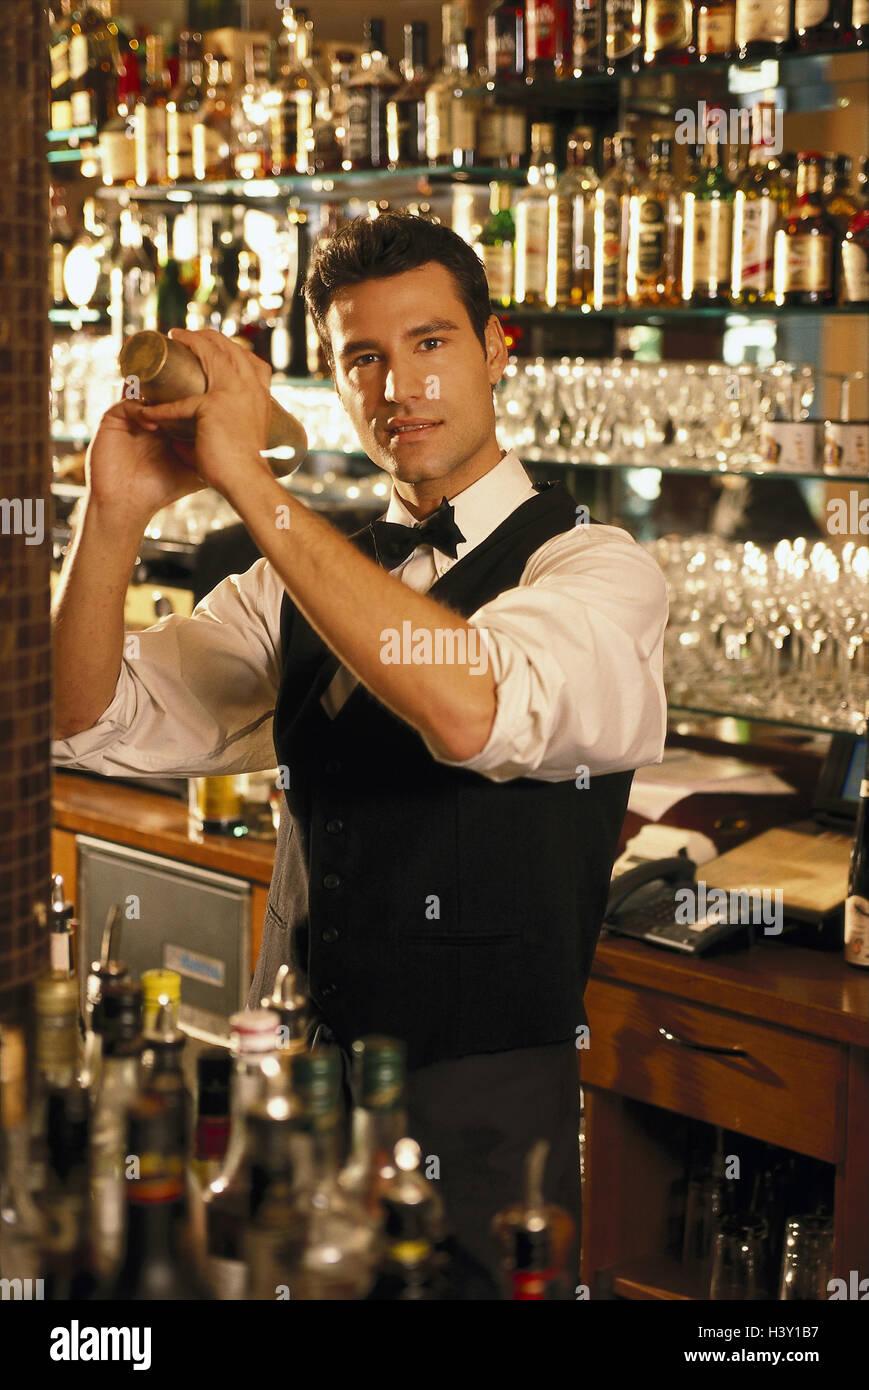 Cash, barkeepers, shakers, inside, bar, bar, waiter, waiter, occupation, part-time job, cocktails, drinks, drinks, Stock Photo